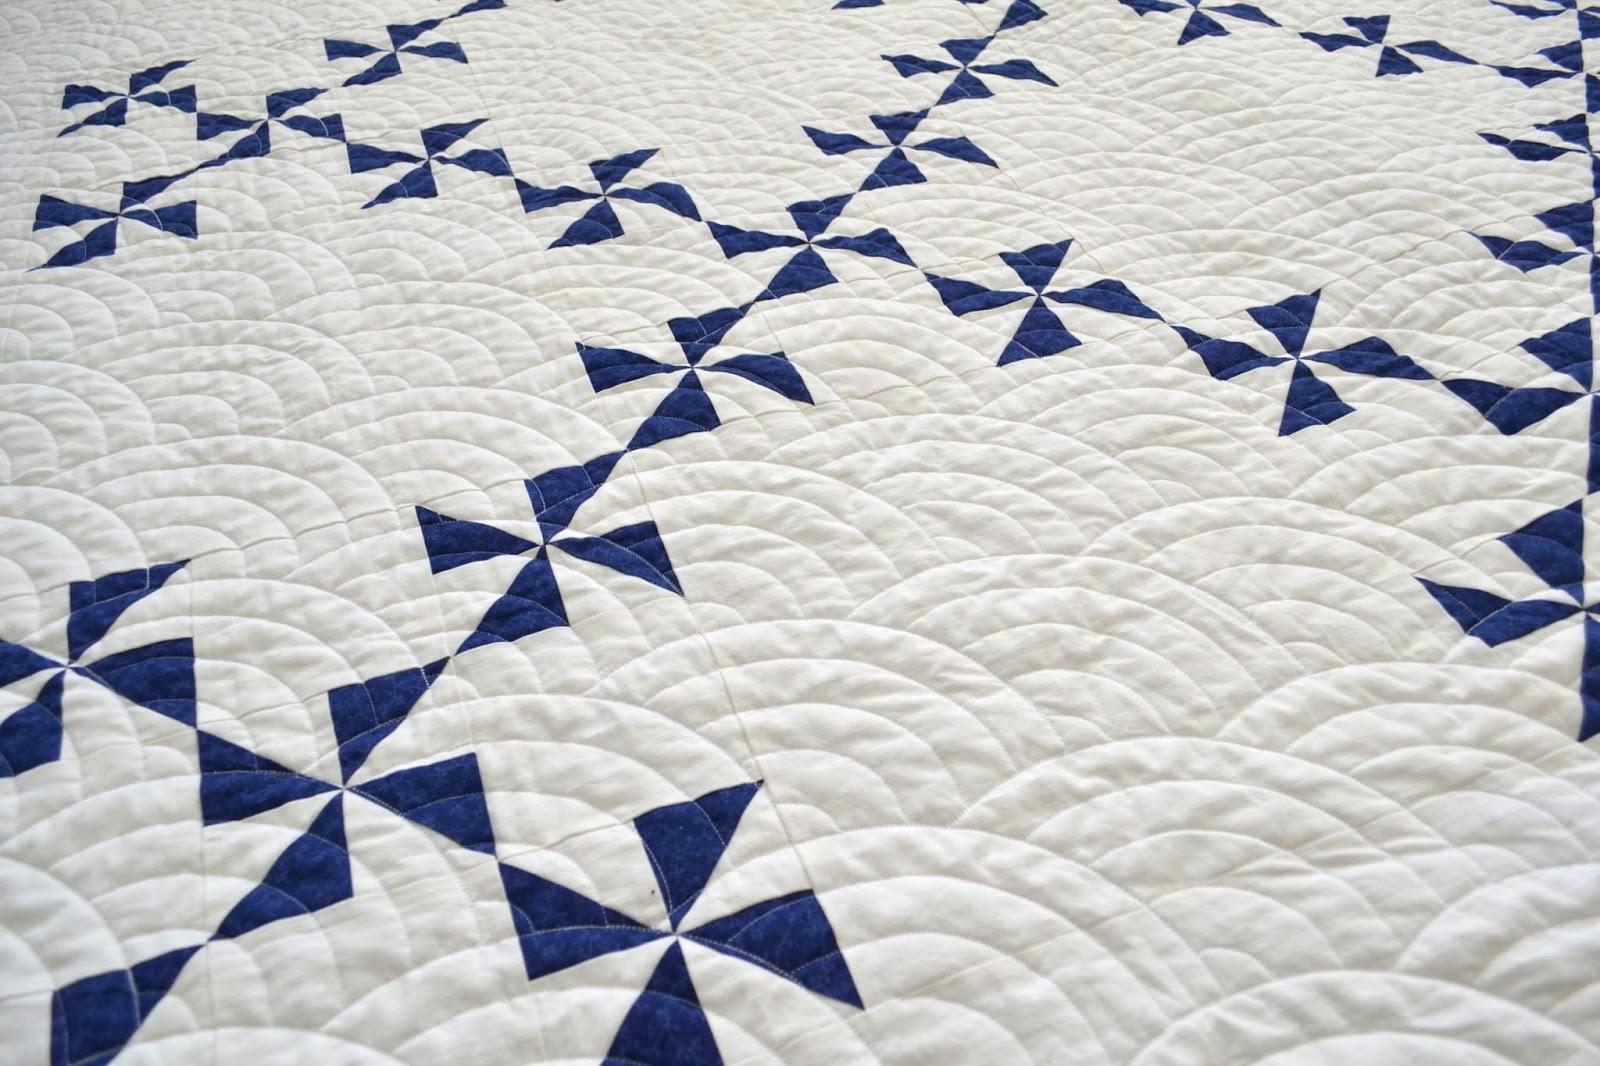 Tea Rose Home: Navy and White Pinwheel Quilt : navy white quilt - Adamdwight.com